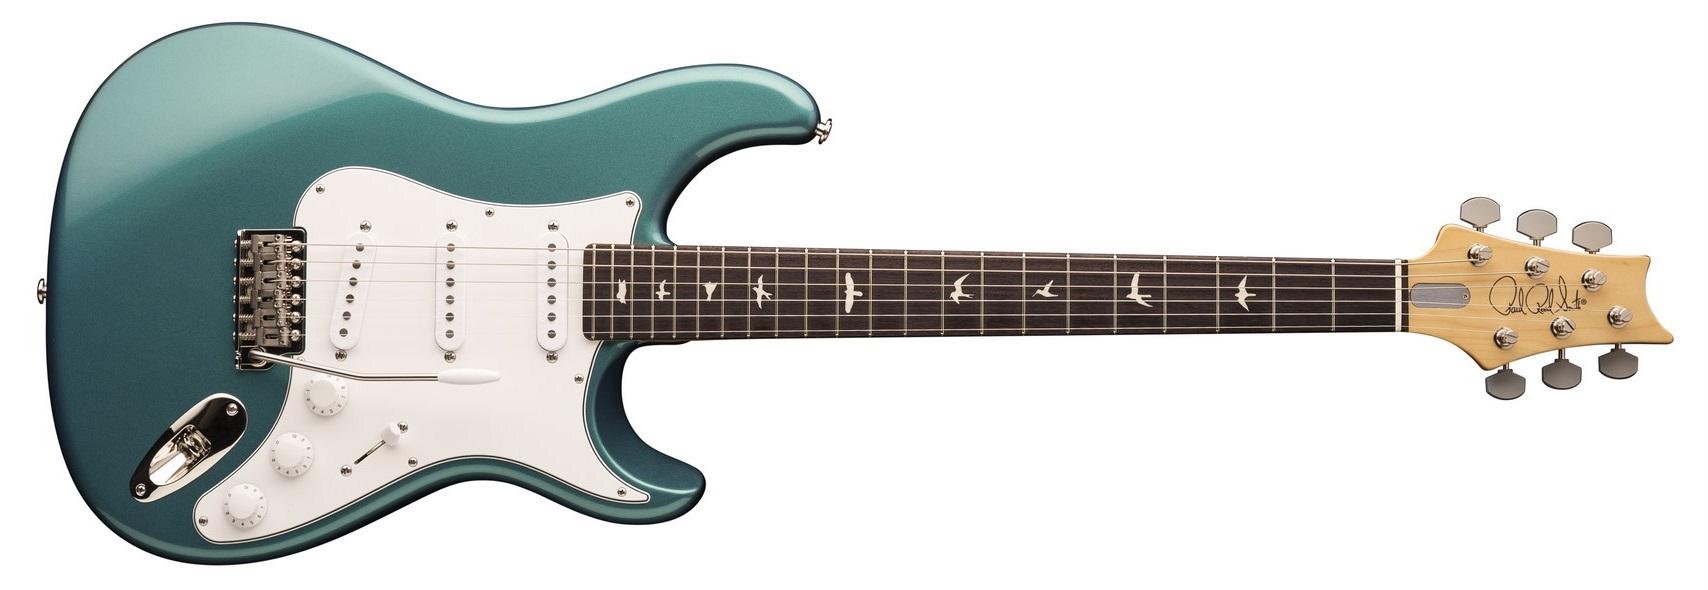 PRS John Mayer Silver Sky Rosewood J5 Dodgem Blue